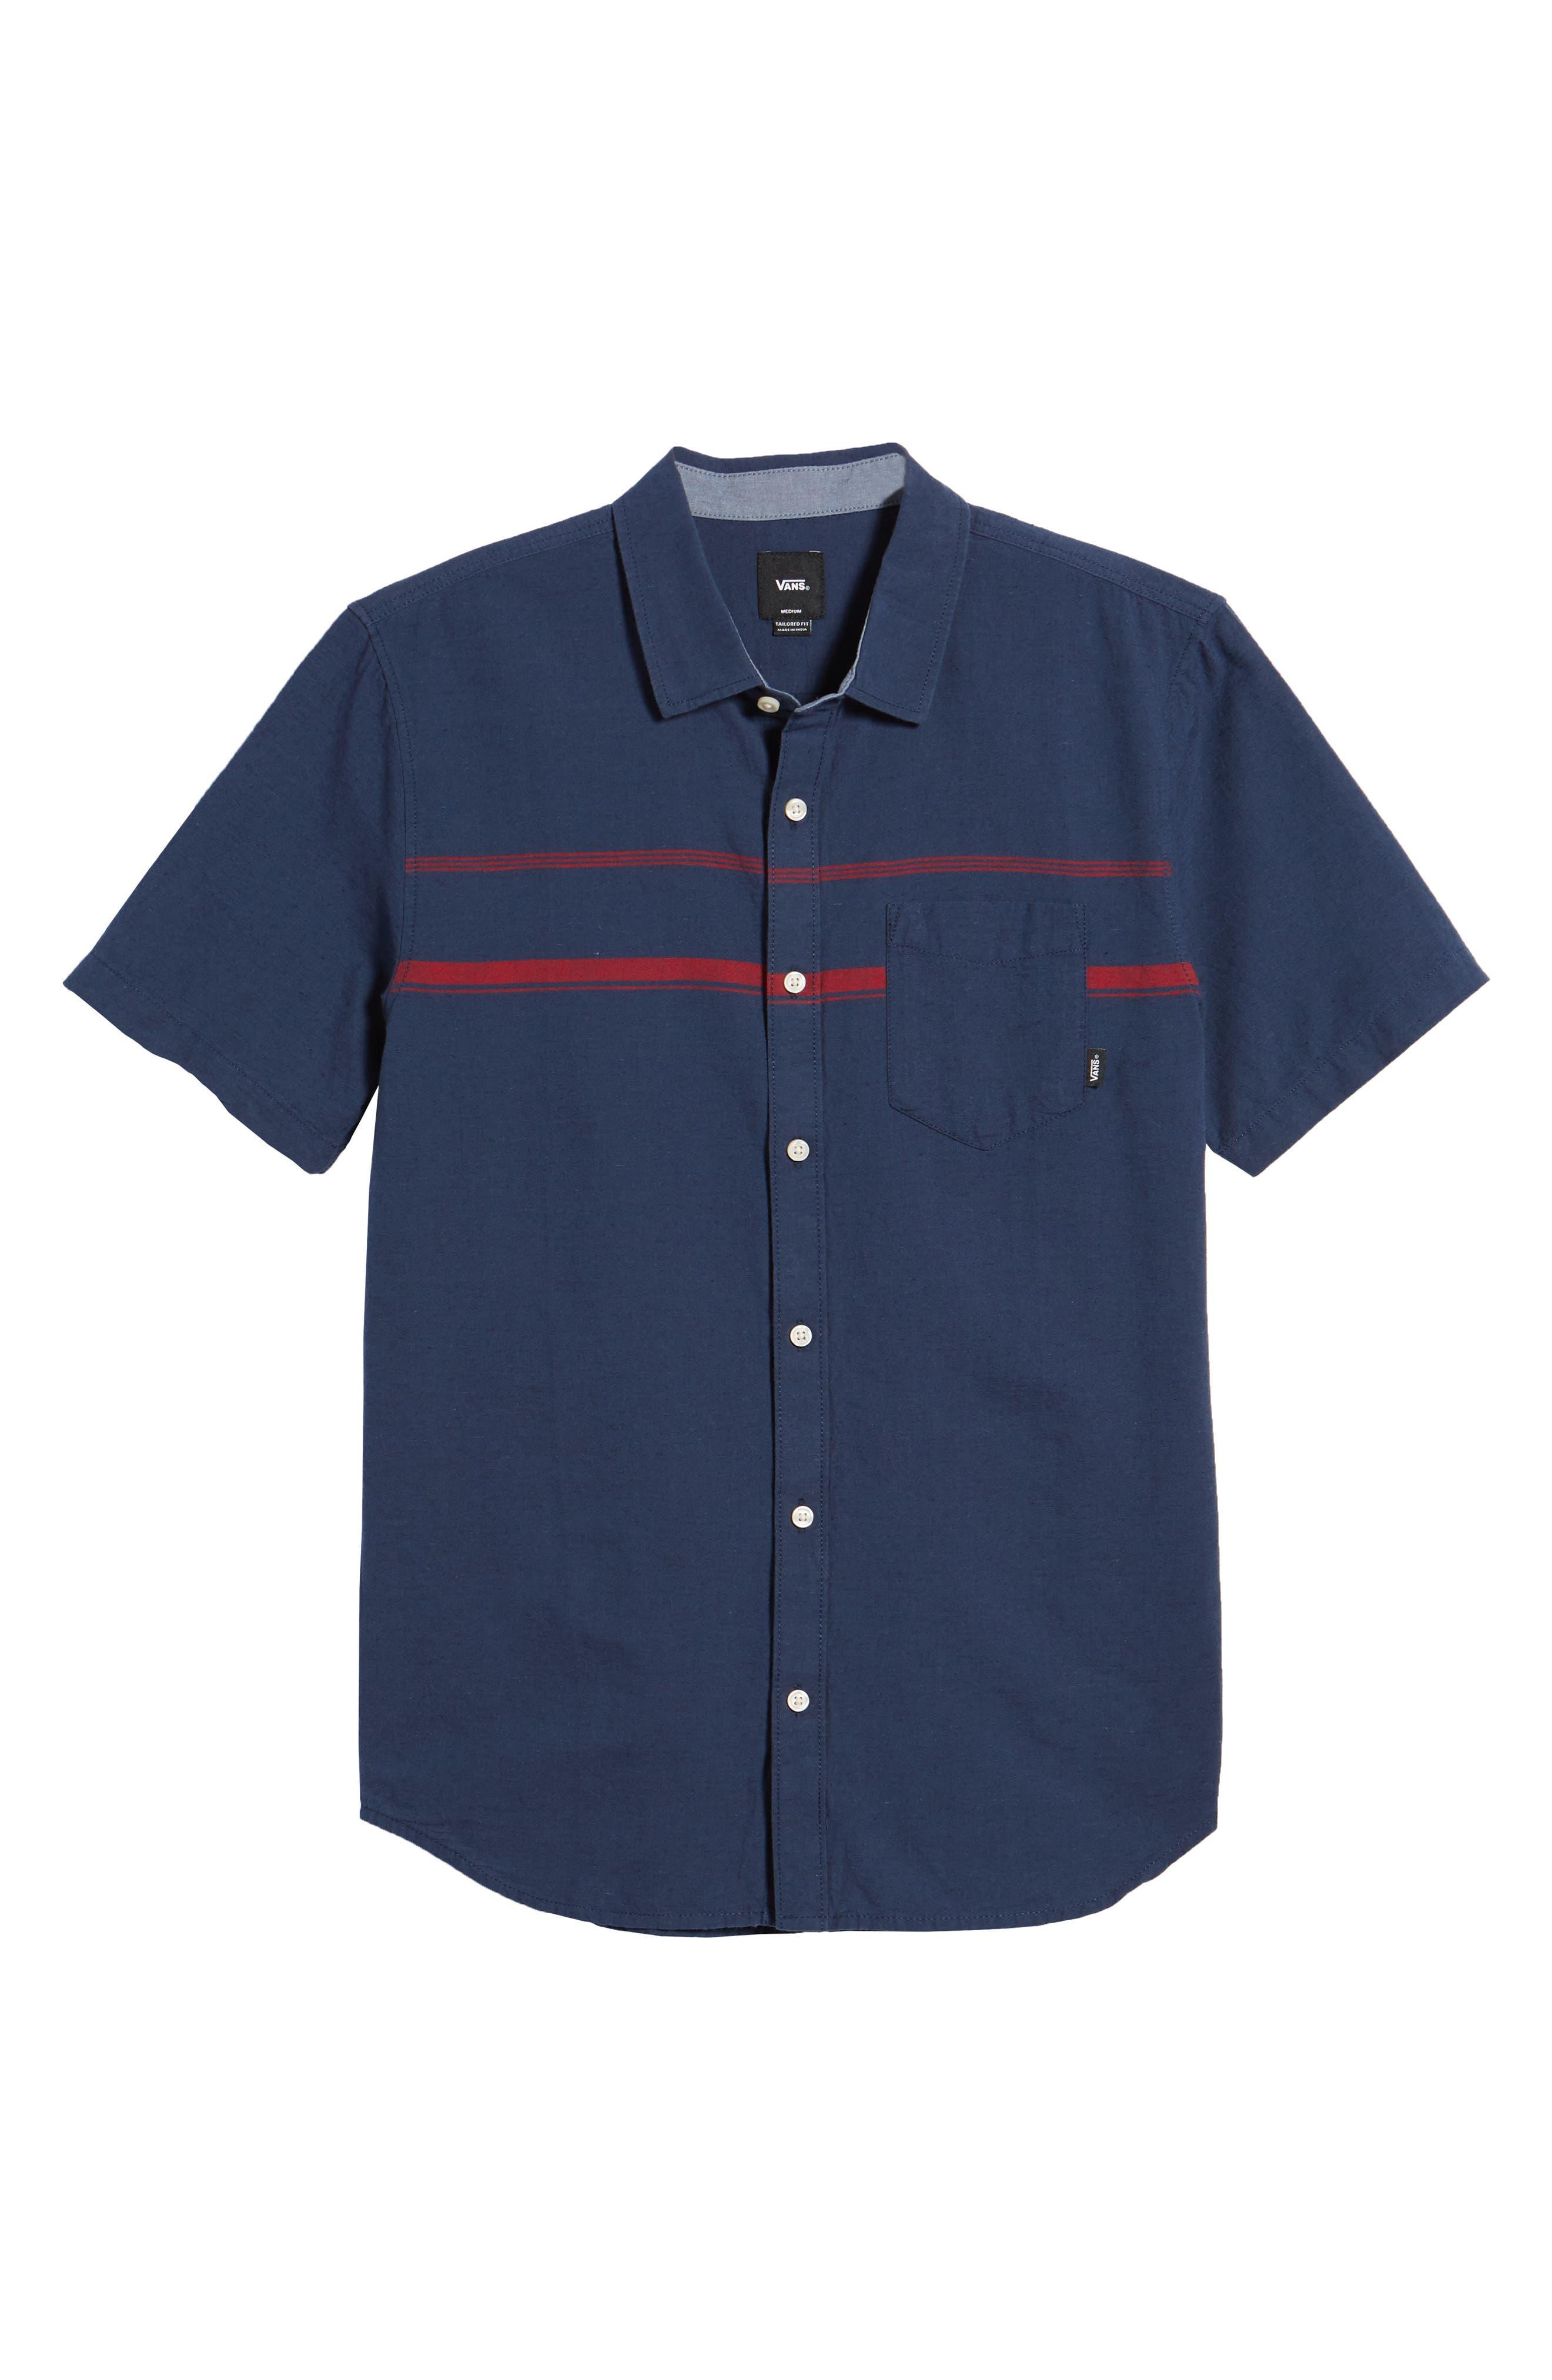 Thurber Short Sleeve Shirt,                             Alternate thumbnail 6, color,                             Dress Blues